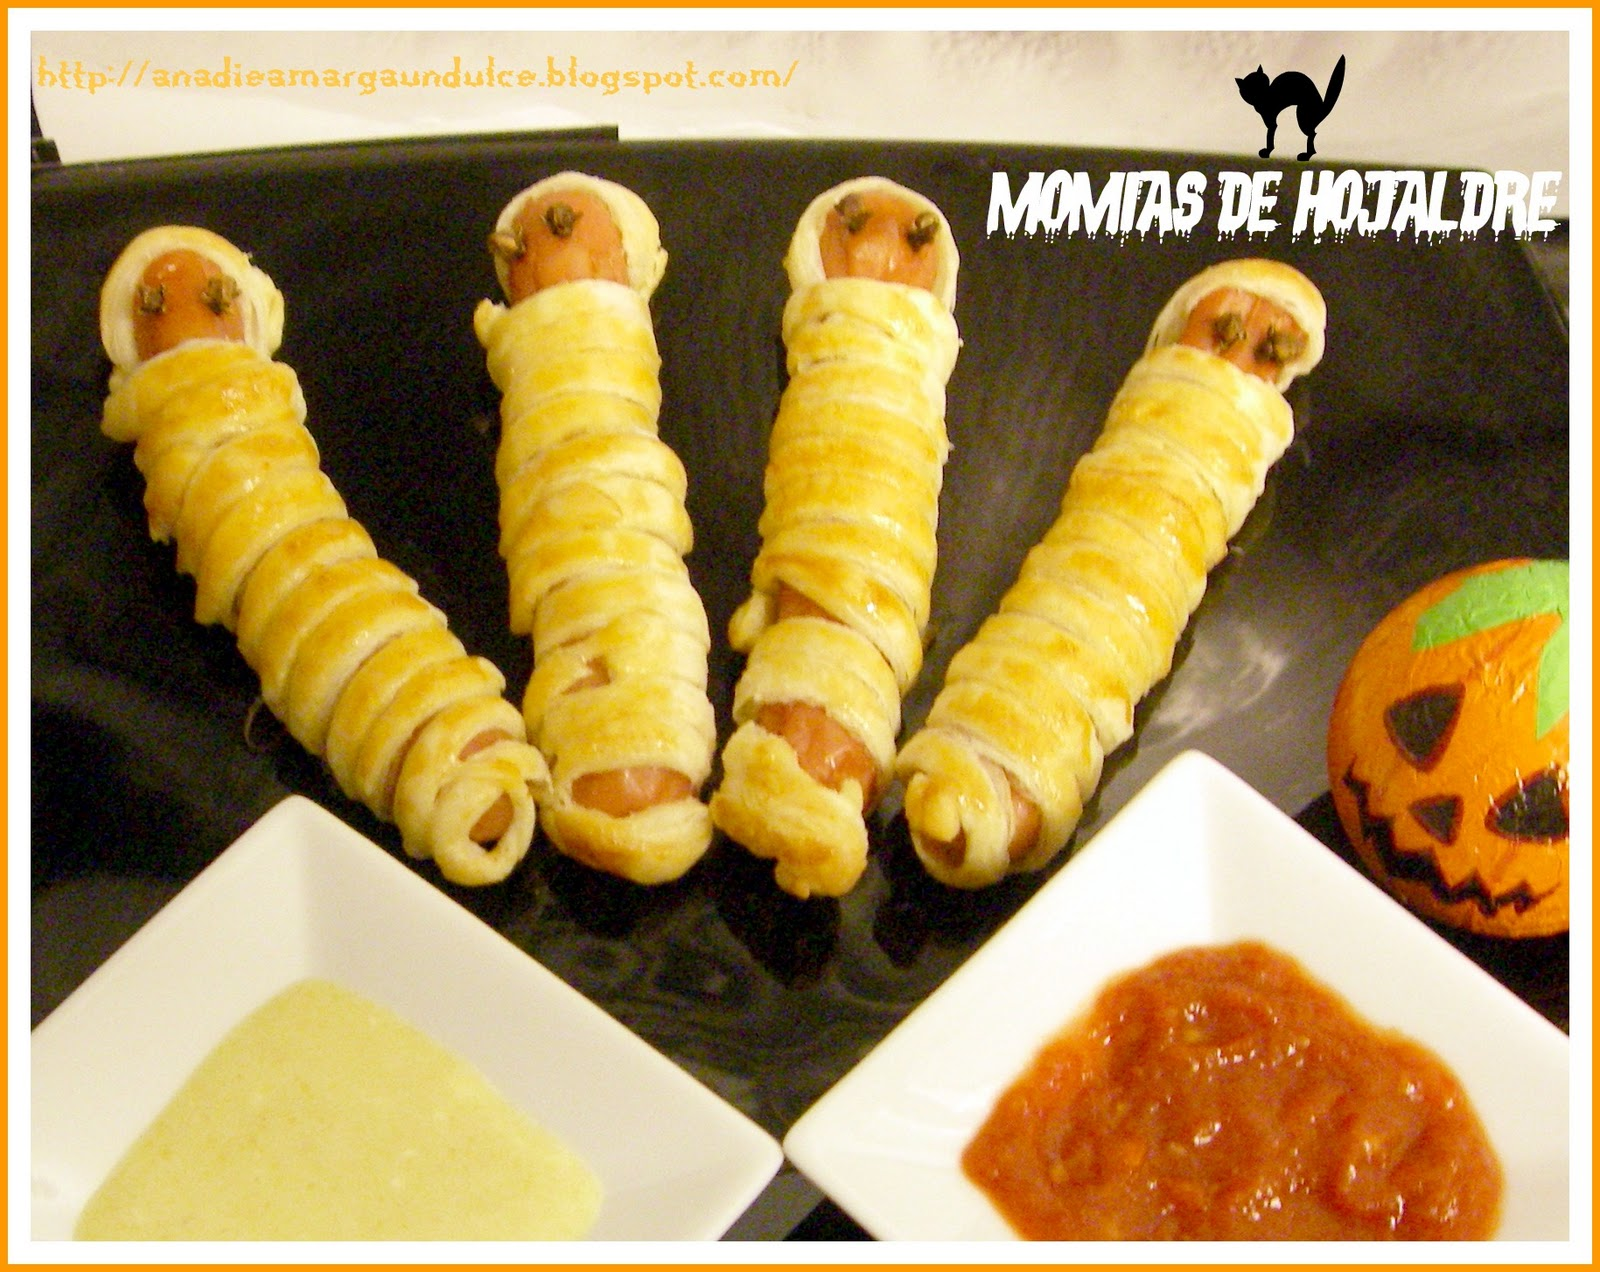 http://anadieamargaundulce.blogspot.com.es/2011/10/momias-de-frankfurt-mis-momias-no.html